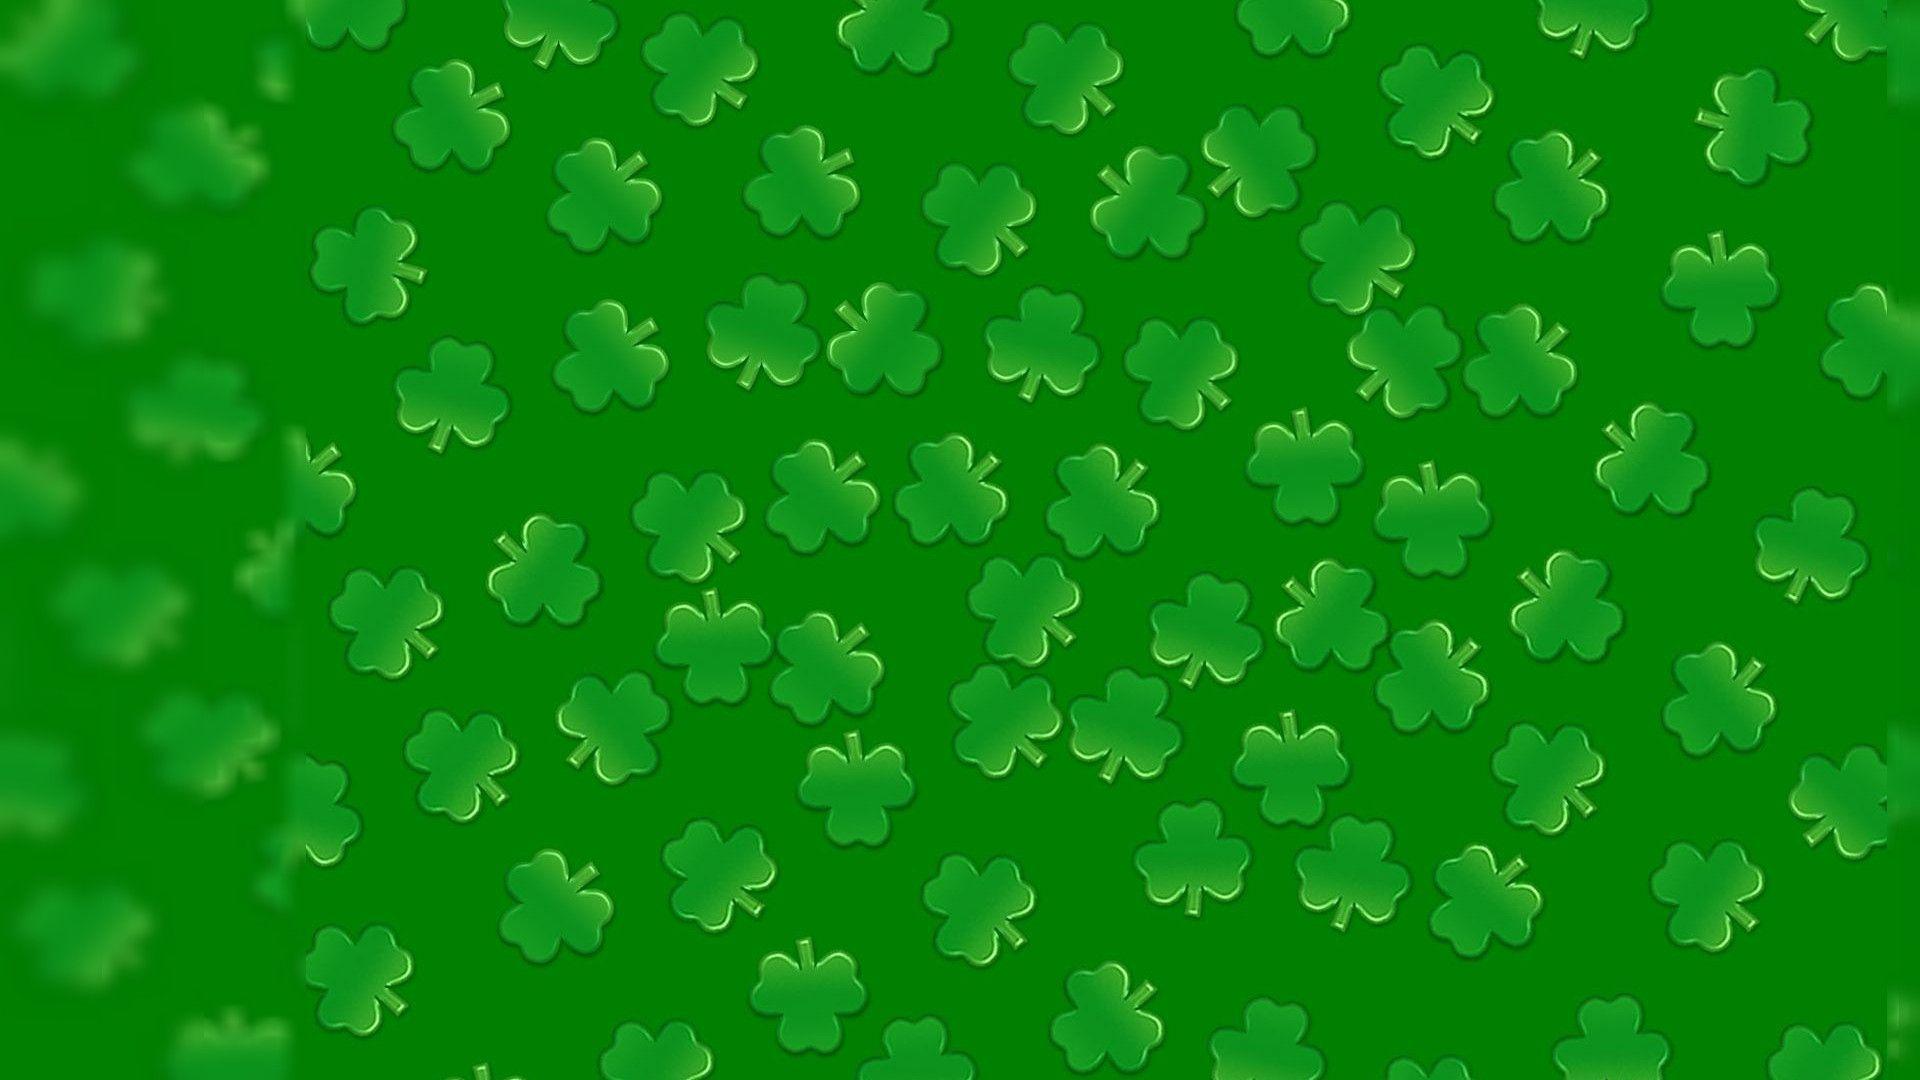 St Patricks Day HD Wallpapers   HD Wallpapers InnWallpaper 1920x1080